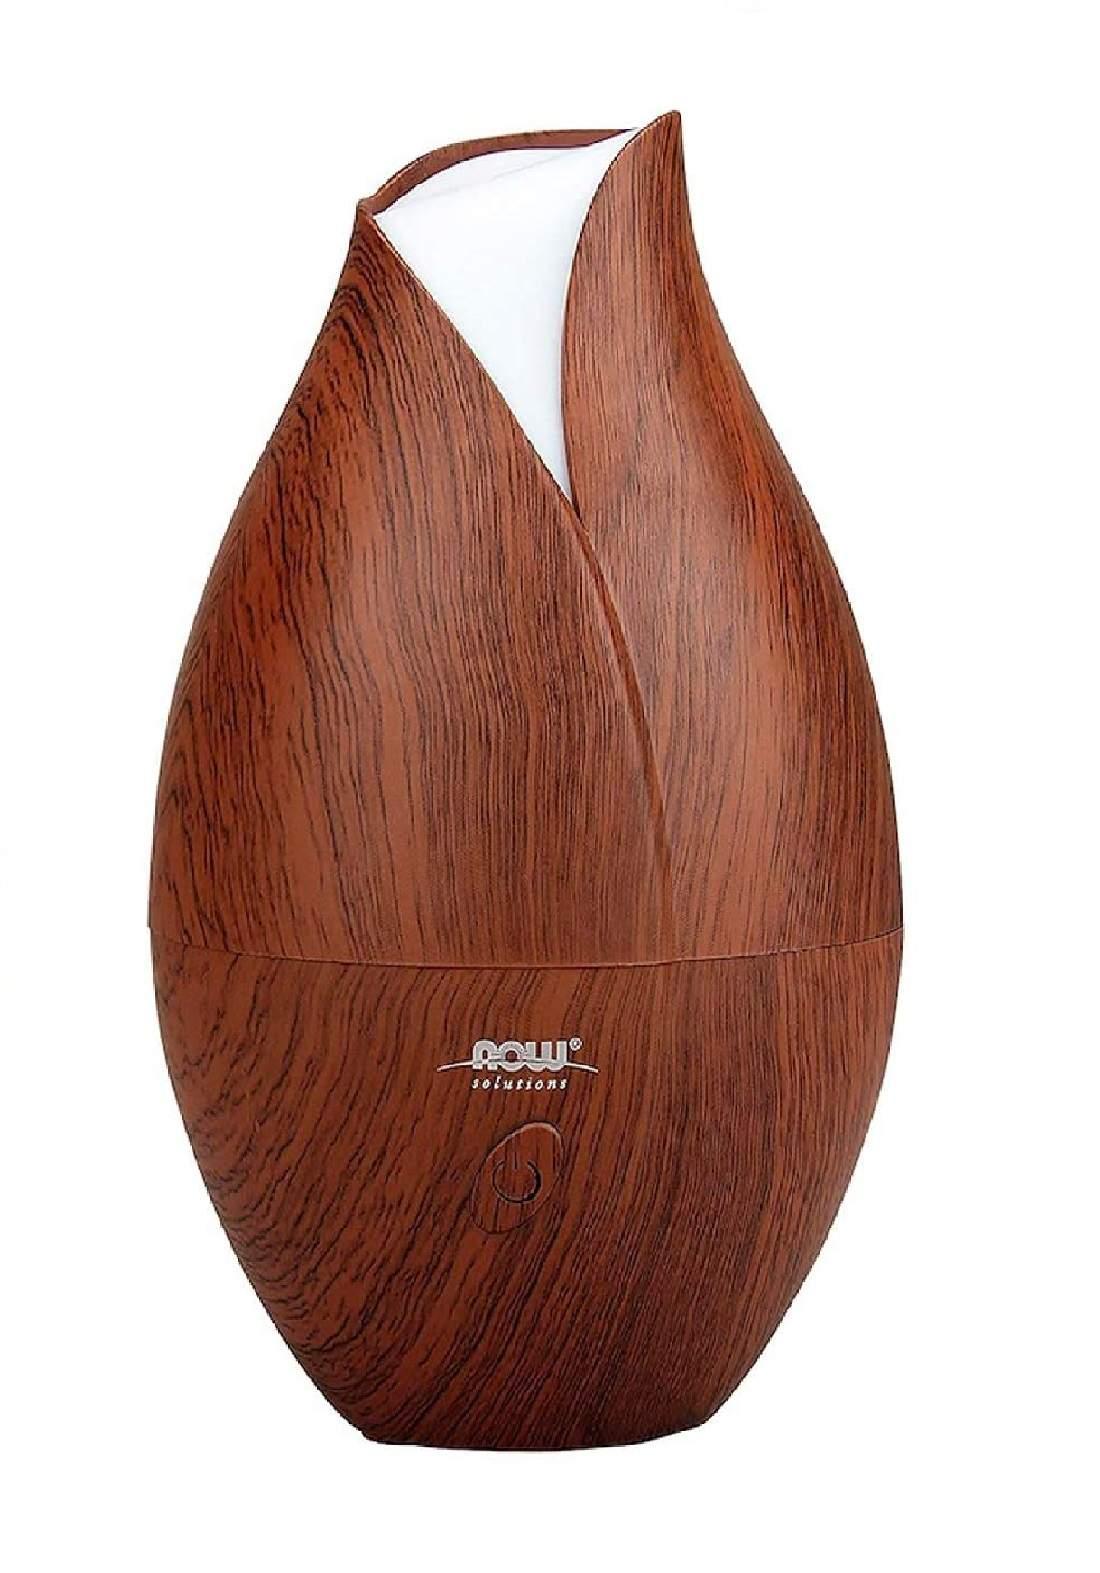 Now Foods Wood Ultrasonic Oil Diffuser 500ml  مبخرة عطرية زيتية